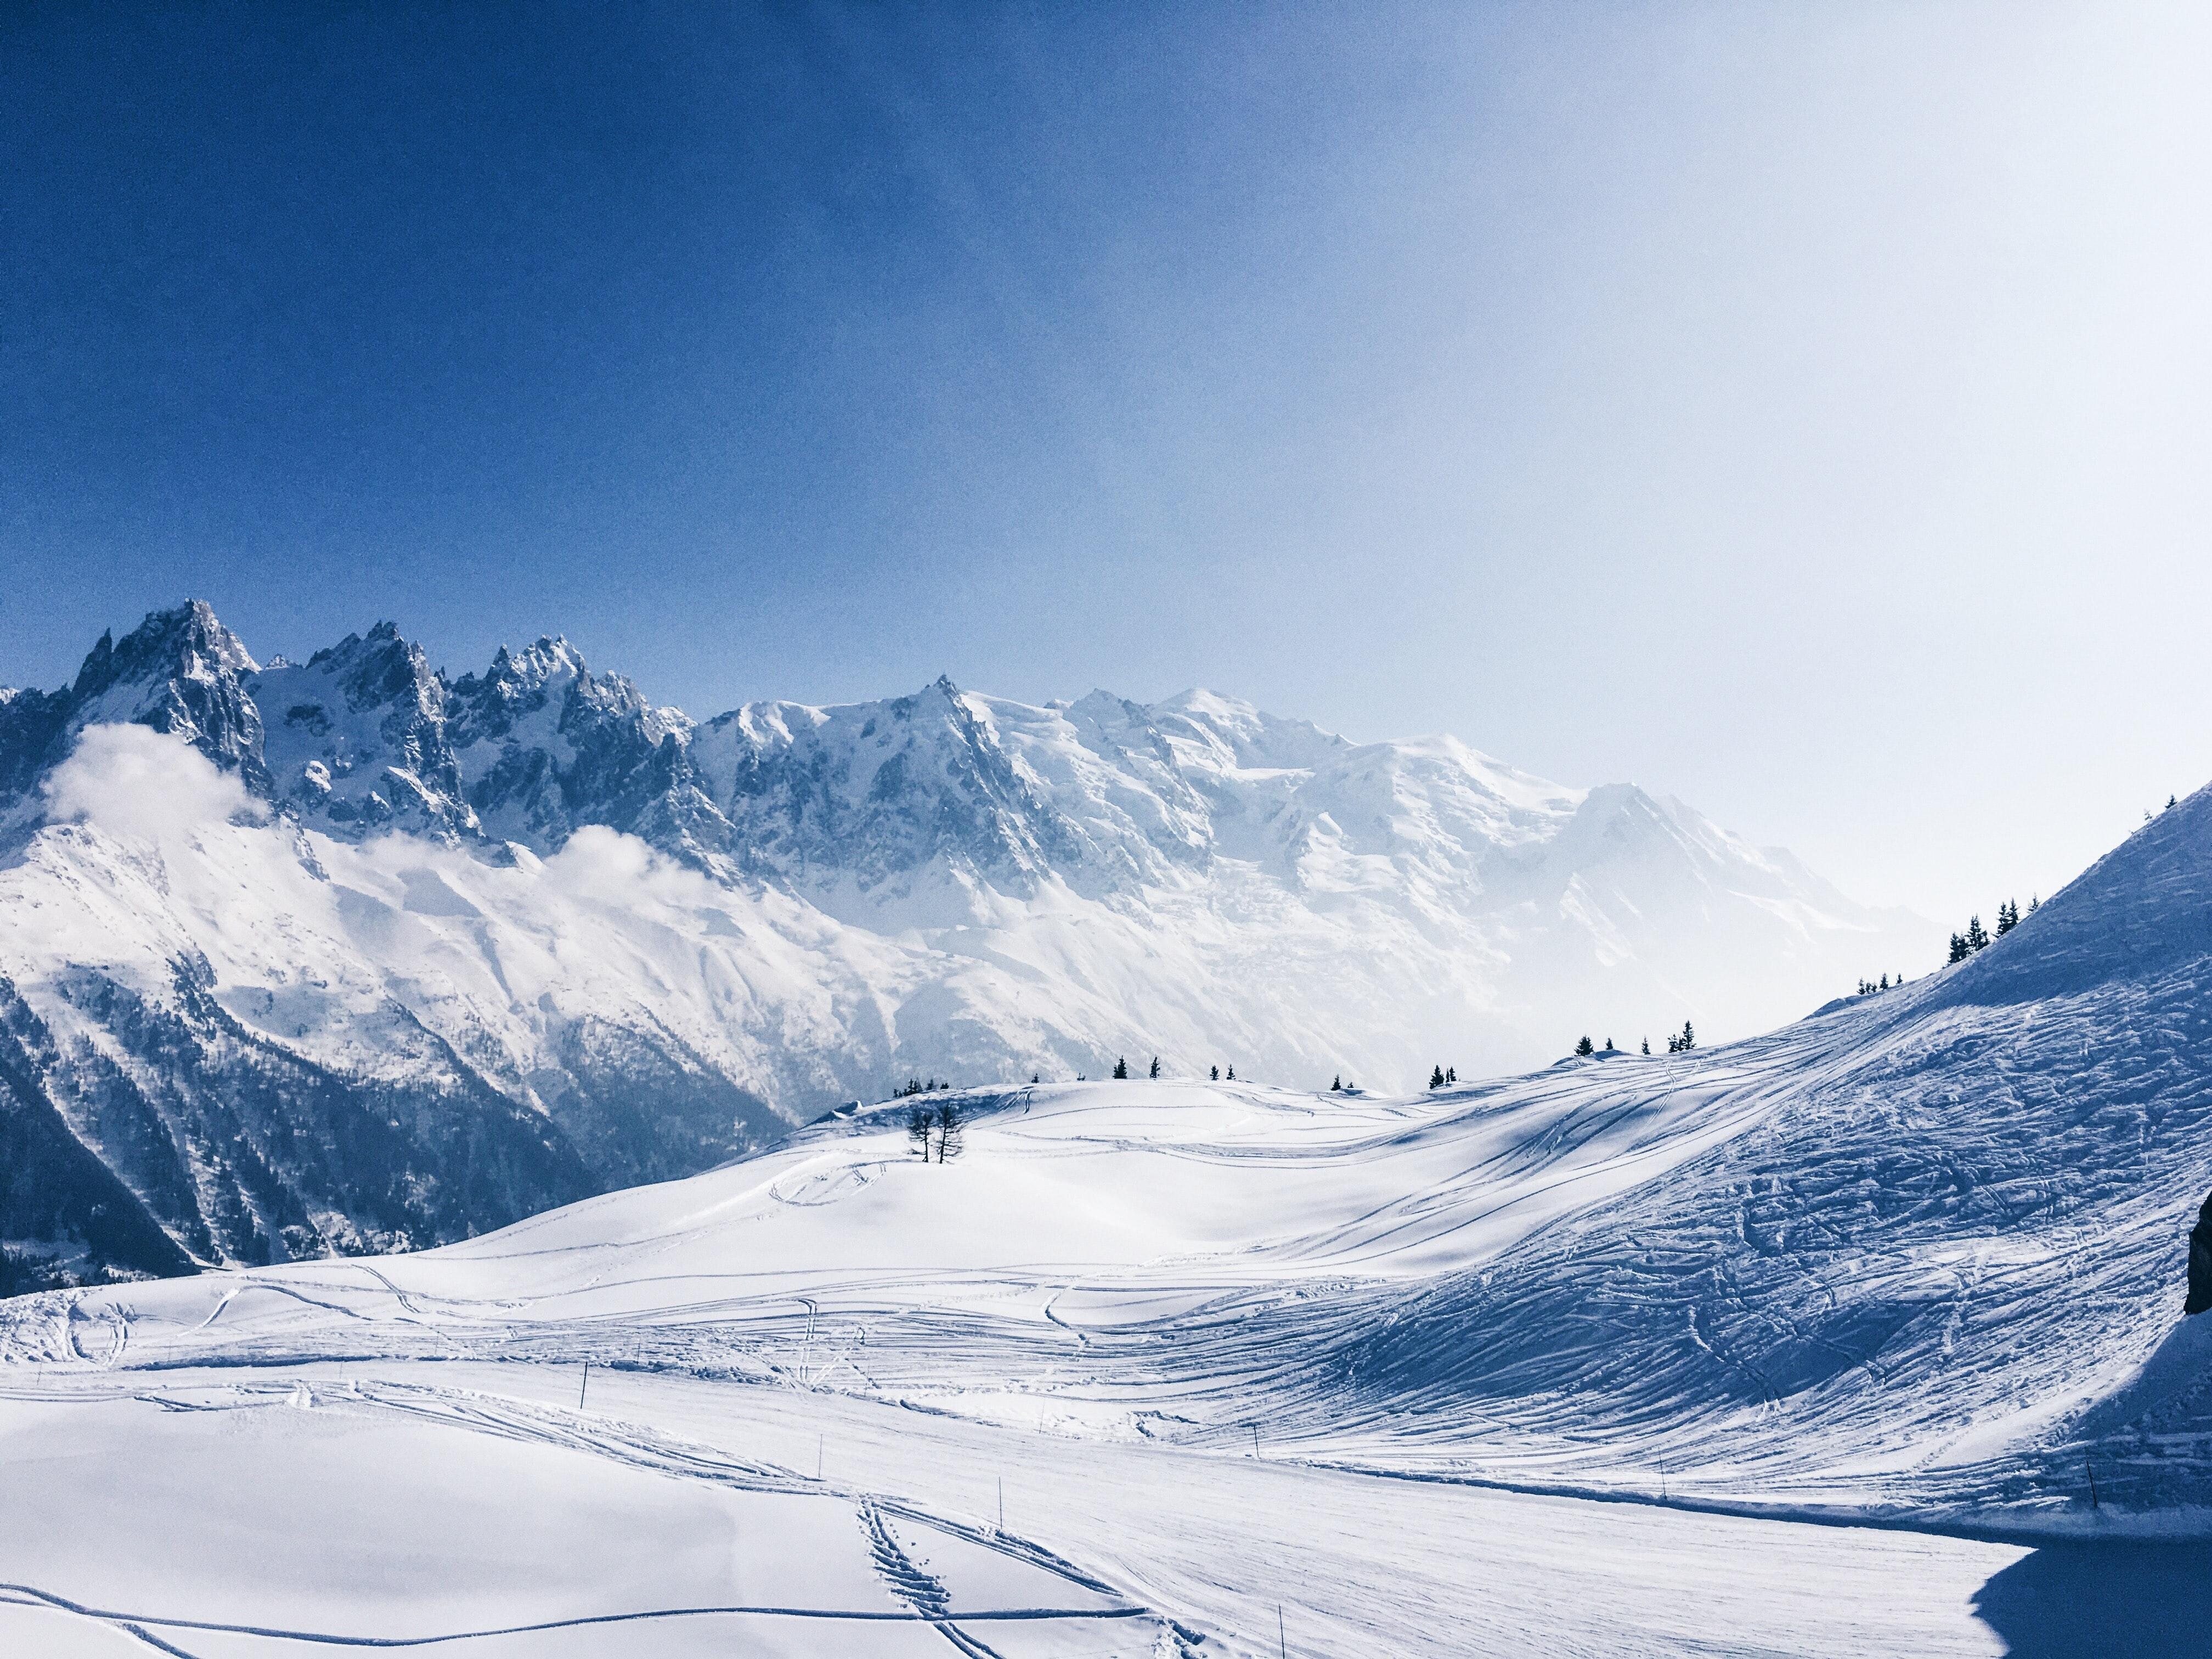 Snow Wallpapers Free Hd Download 500 Hq Unsplash